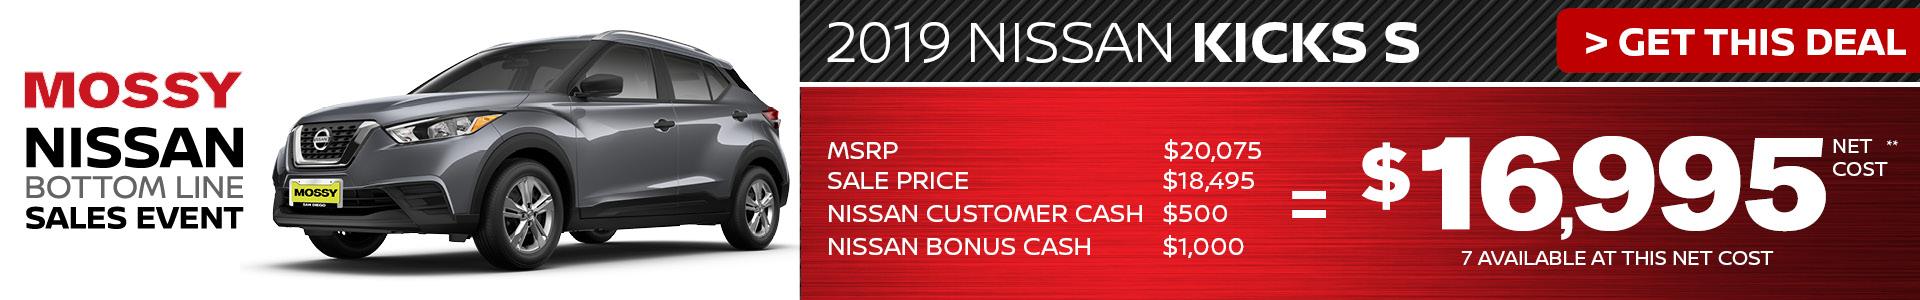 Mossy Nissan - Nissan Kicks $16,995 Purchase